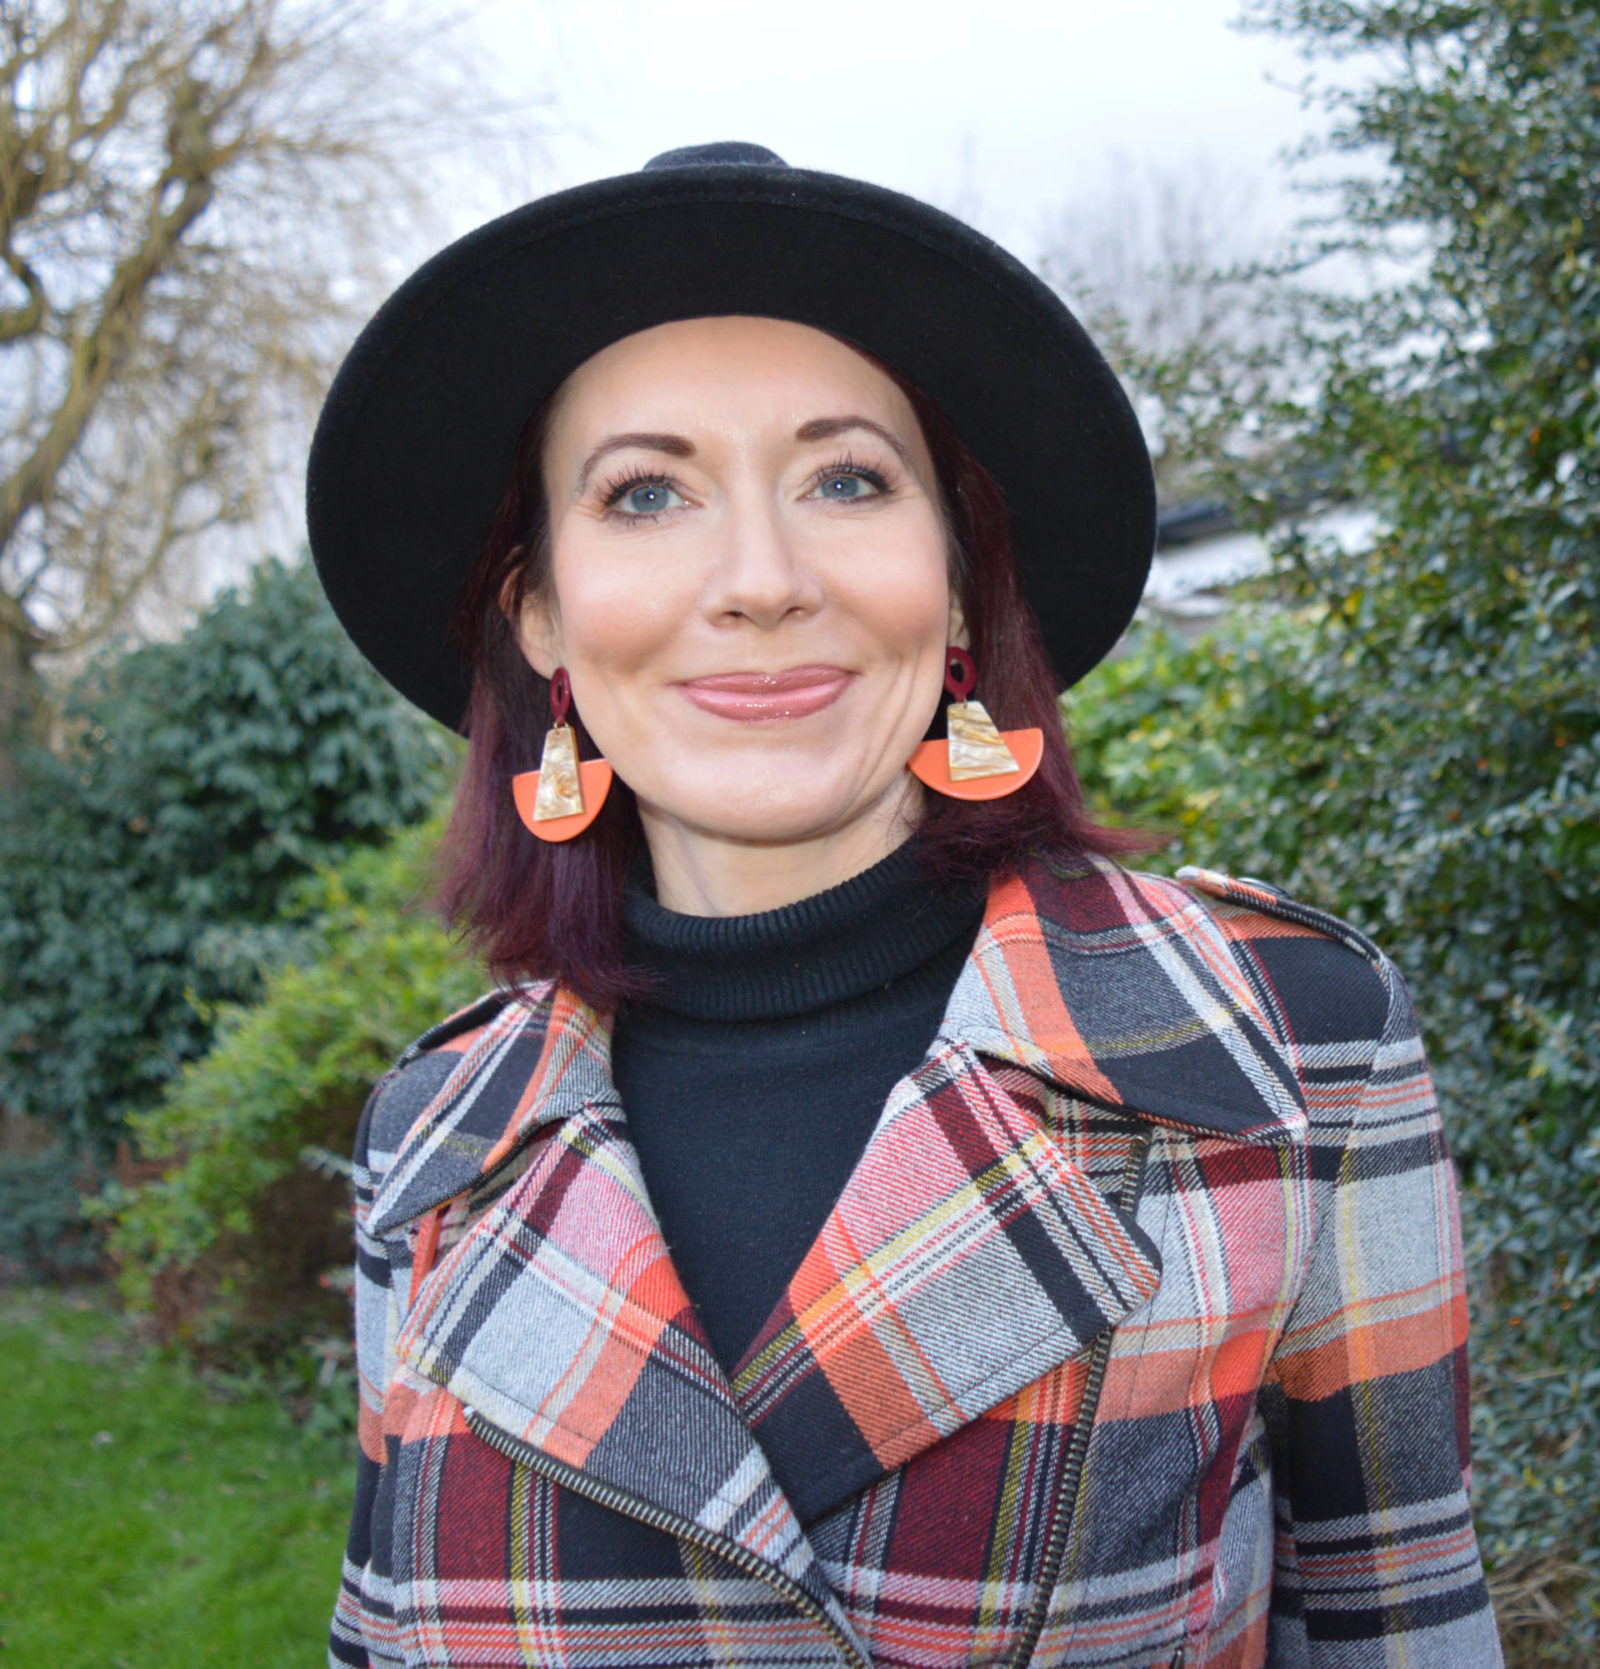 French Connection tartan cropped jacket, Mango orange resin earrings